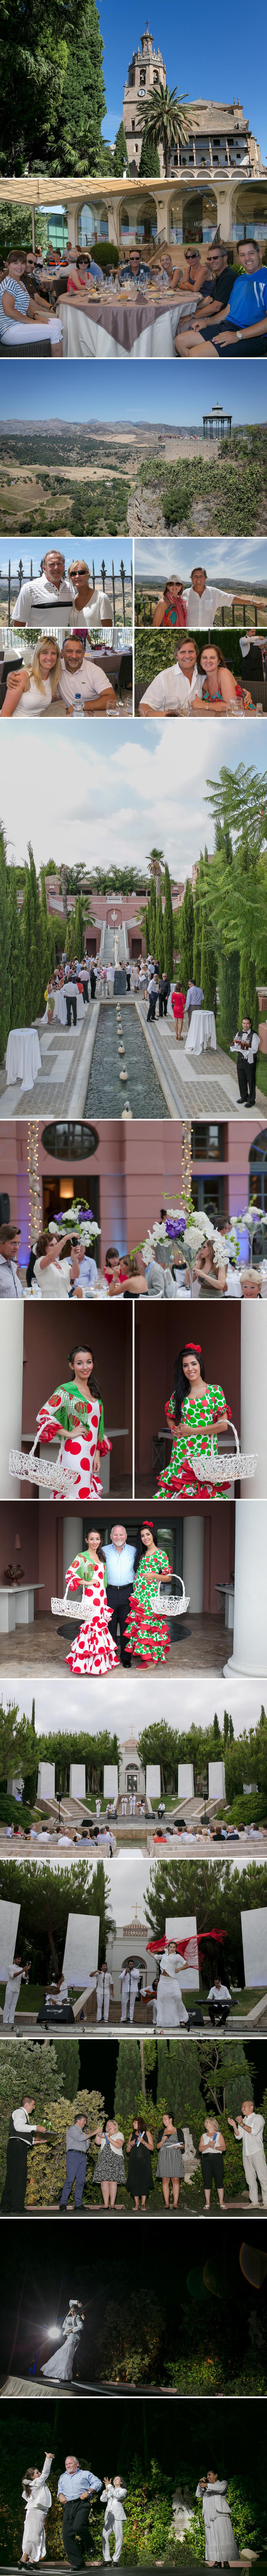 event-photographer-villa-padierna-marbella